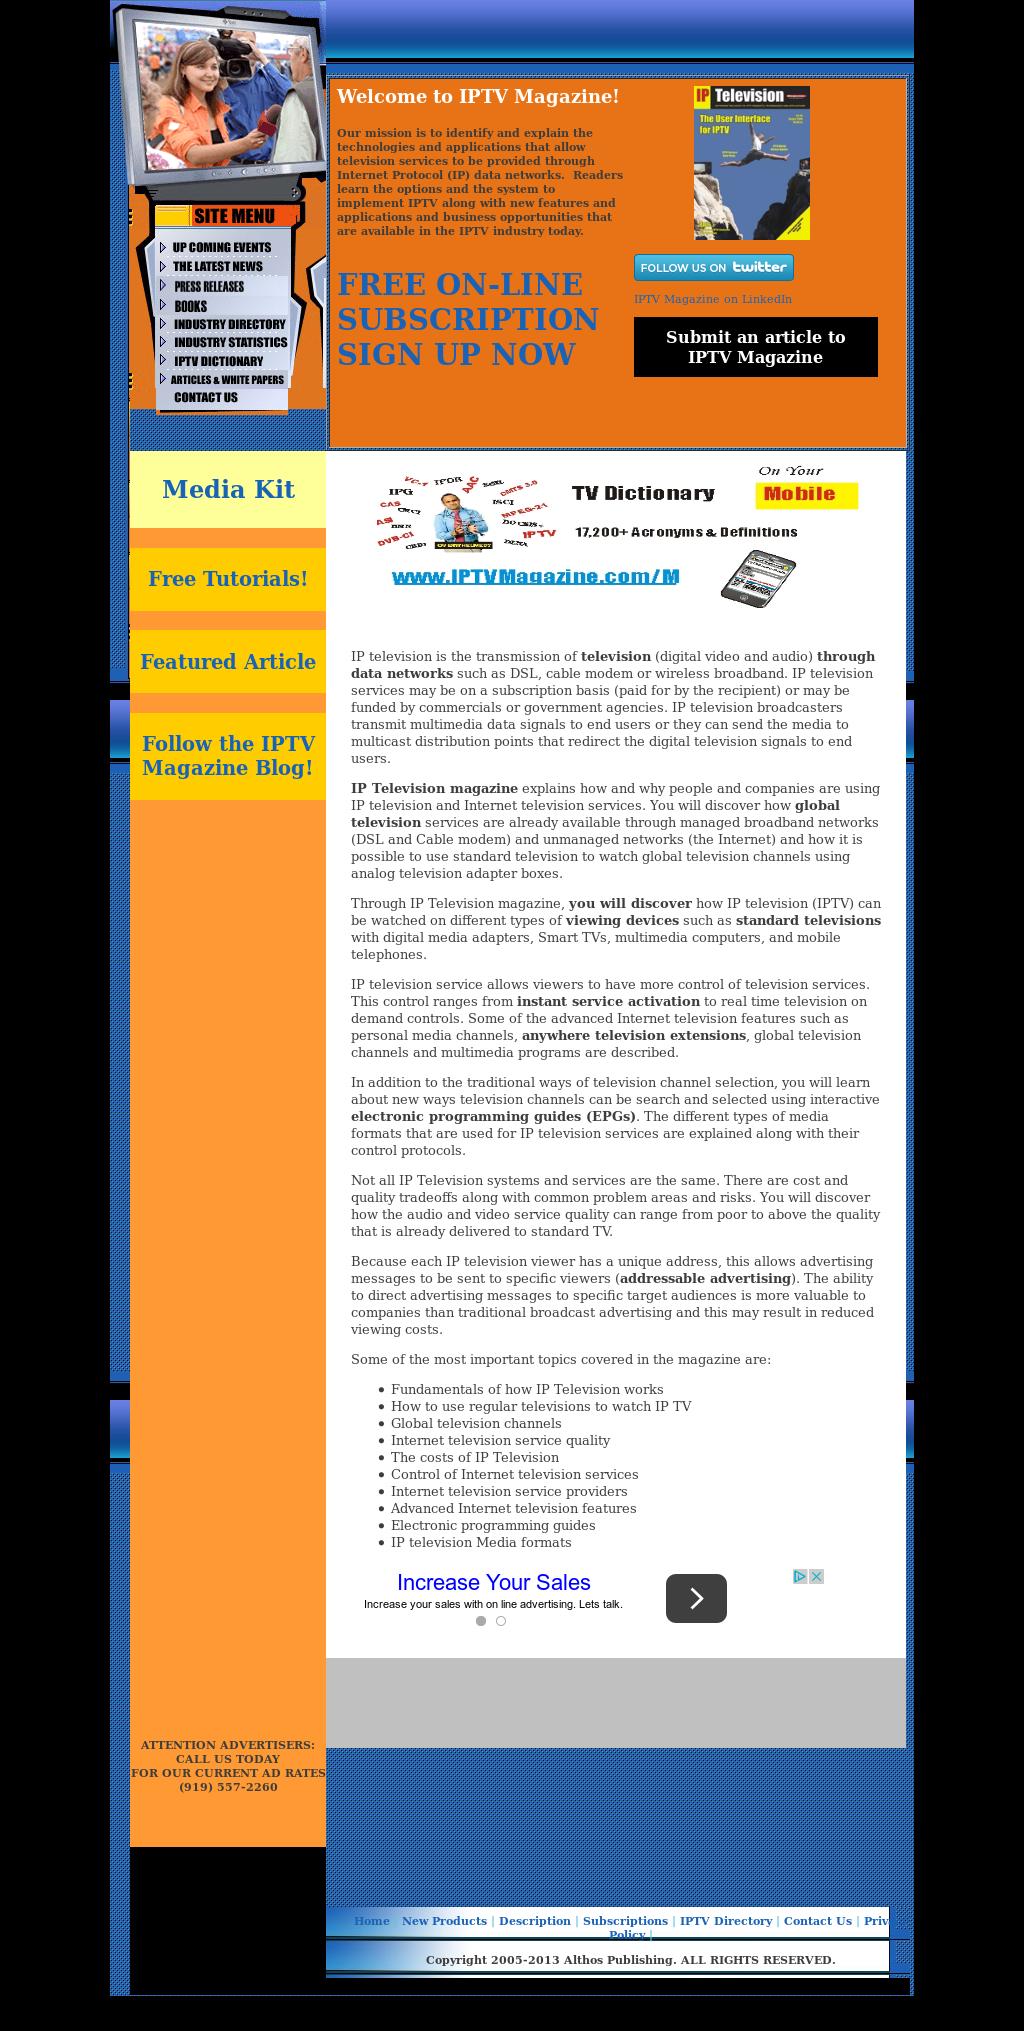 IPTV Magazine Competitors, Revenue and Employees - Owler Company Profile